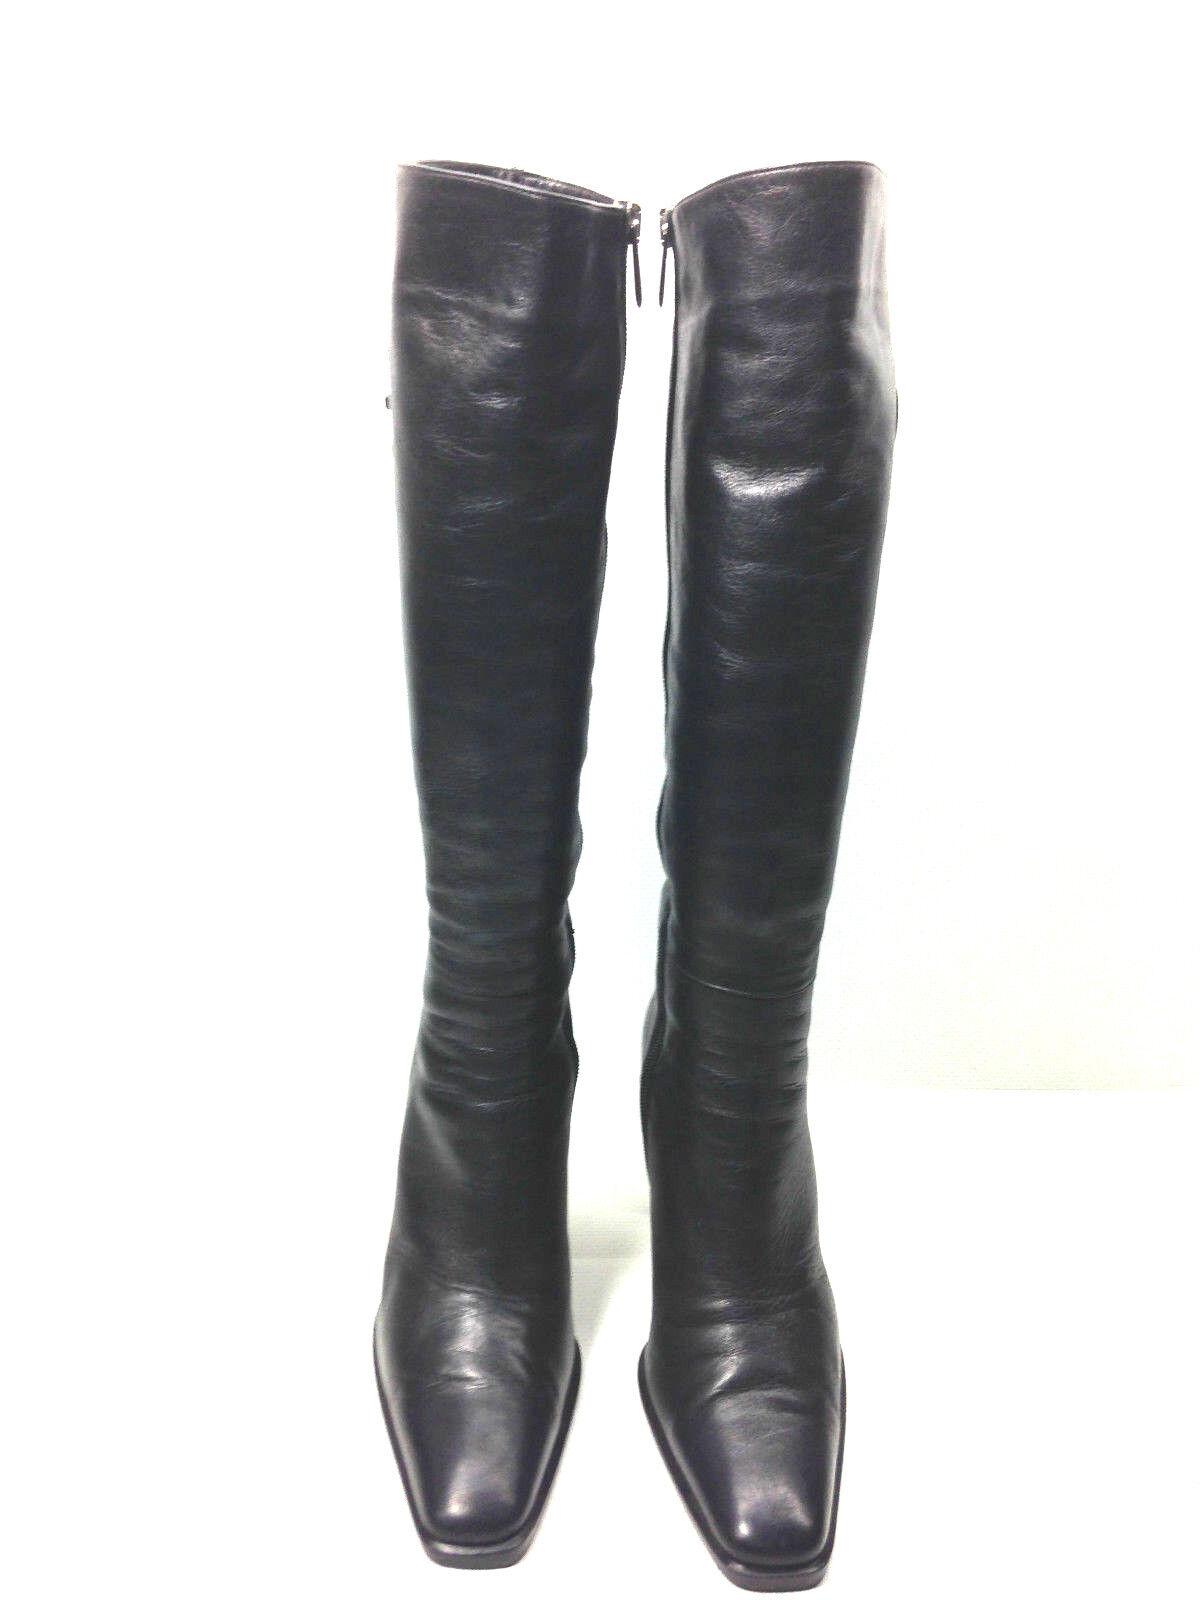 Claudio Fracassa Fur Lined Knee High Black Women's Boots  EUR.36 US. 6